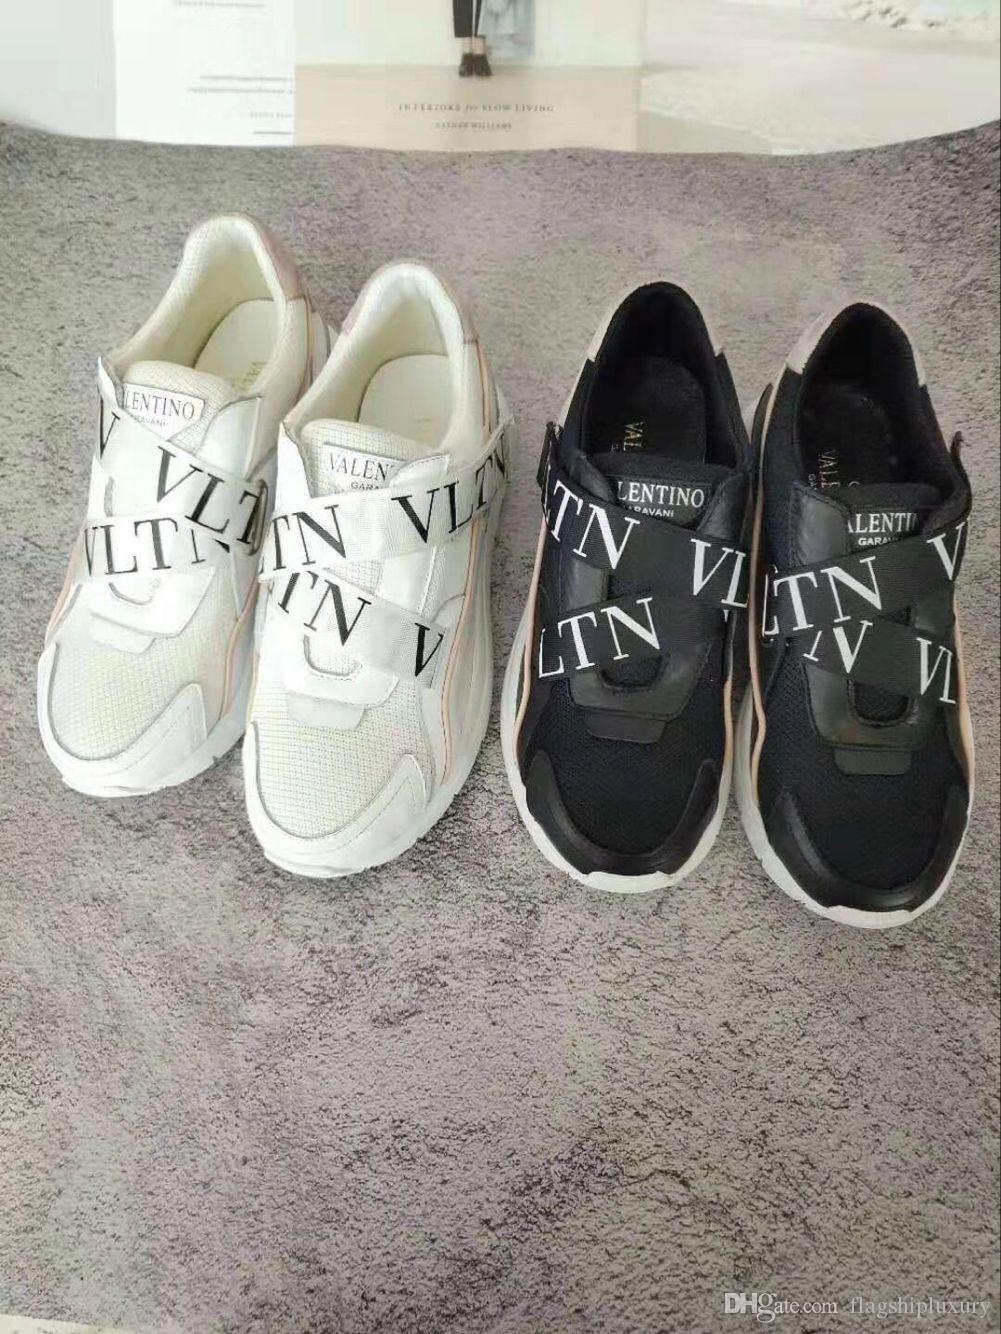 d54ee3da90a47 New VAL Casual Shoes Men Women Real Leather Studs Flat Heels Sandal 36 41  Slippers Slide Sandals Unisex Outdoor Beach Flip Flops Sandals For Women  Knee High ...